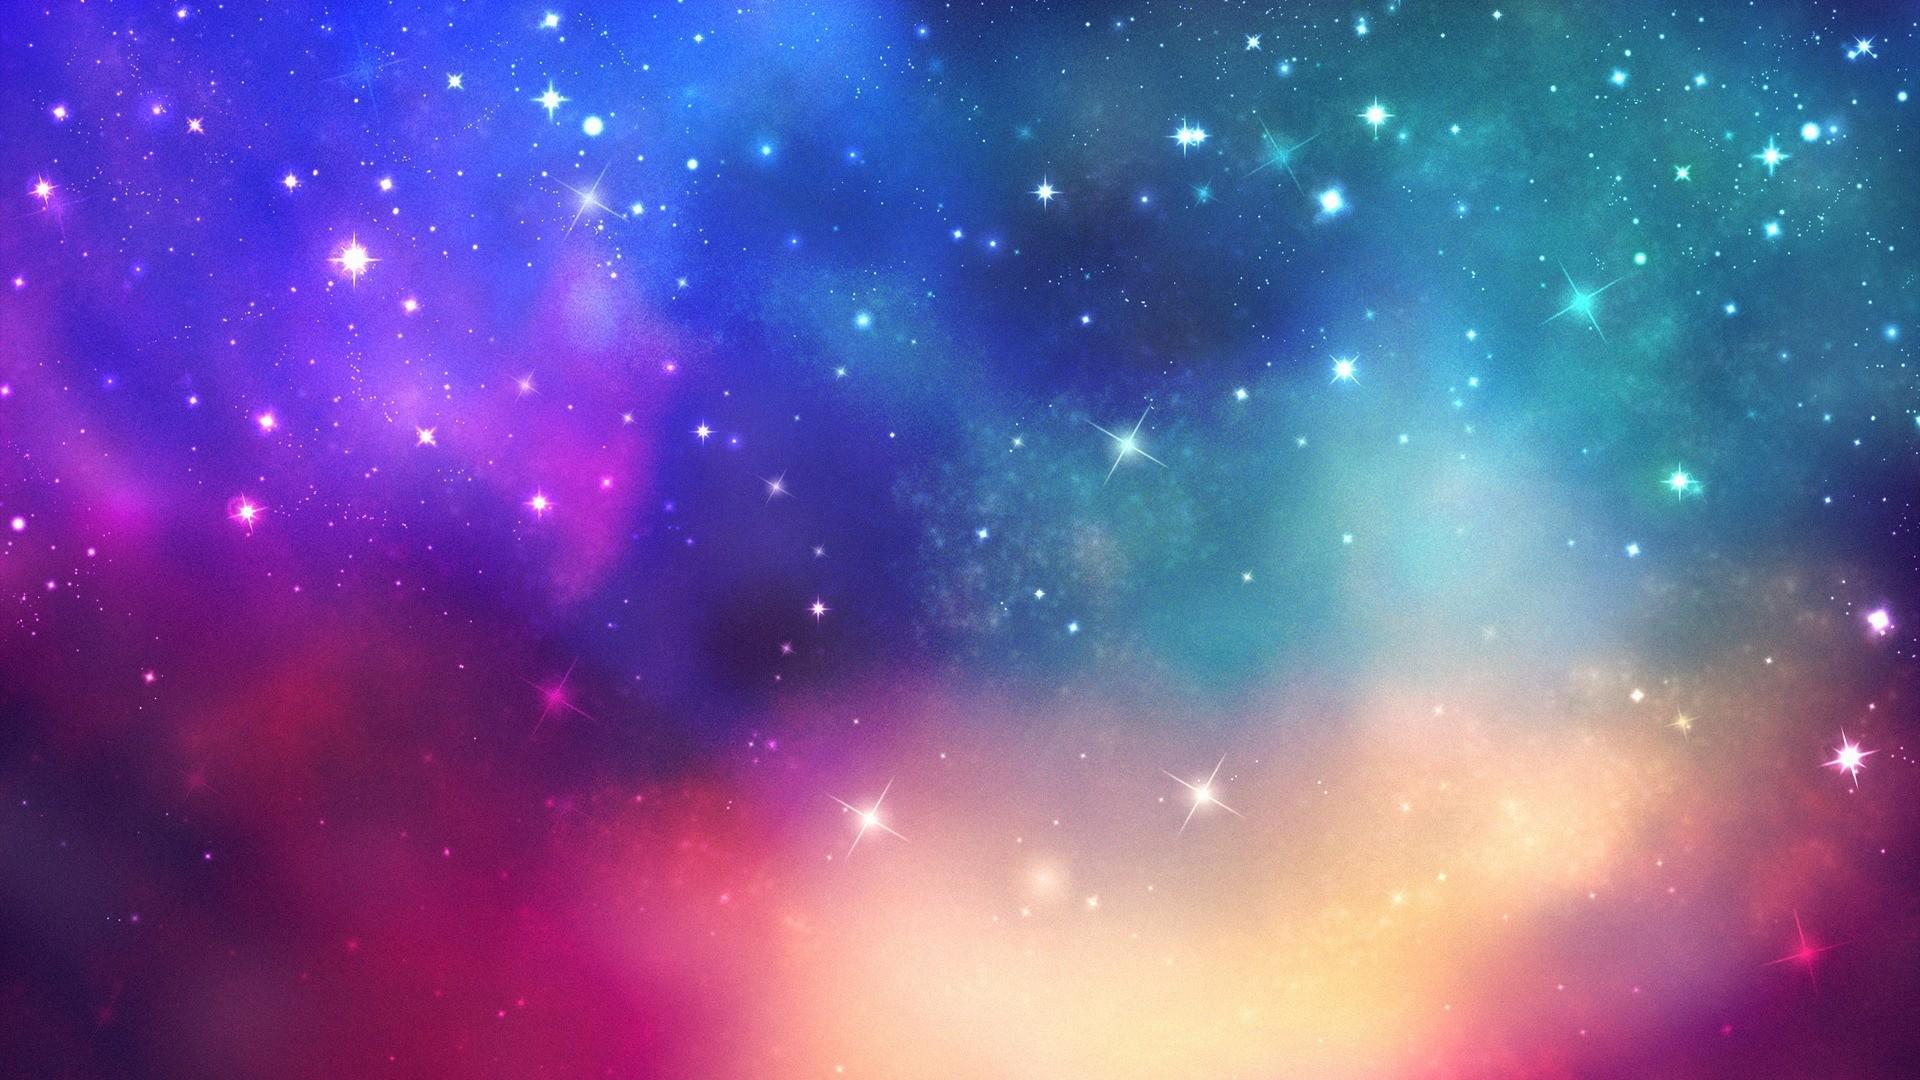 More Space desktop wallpapers